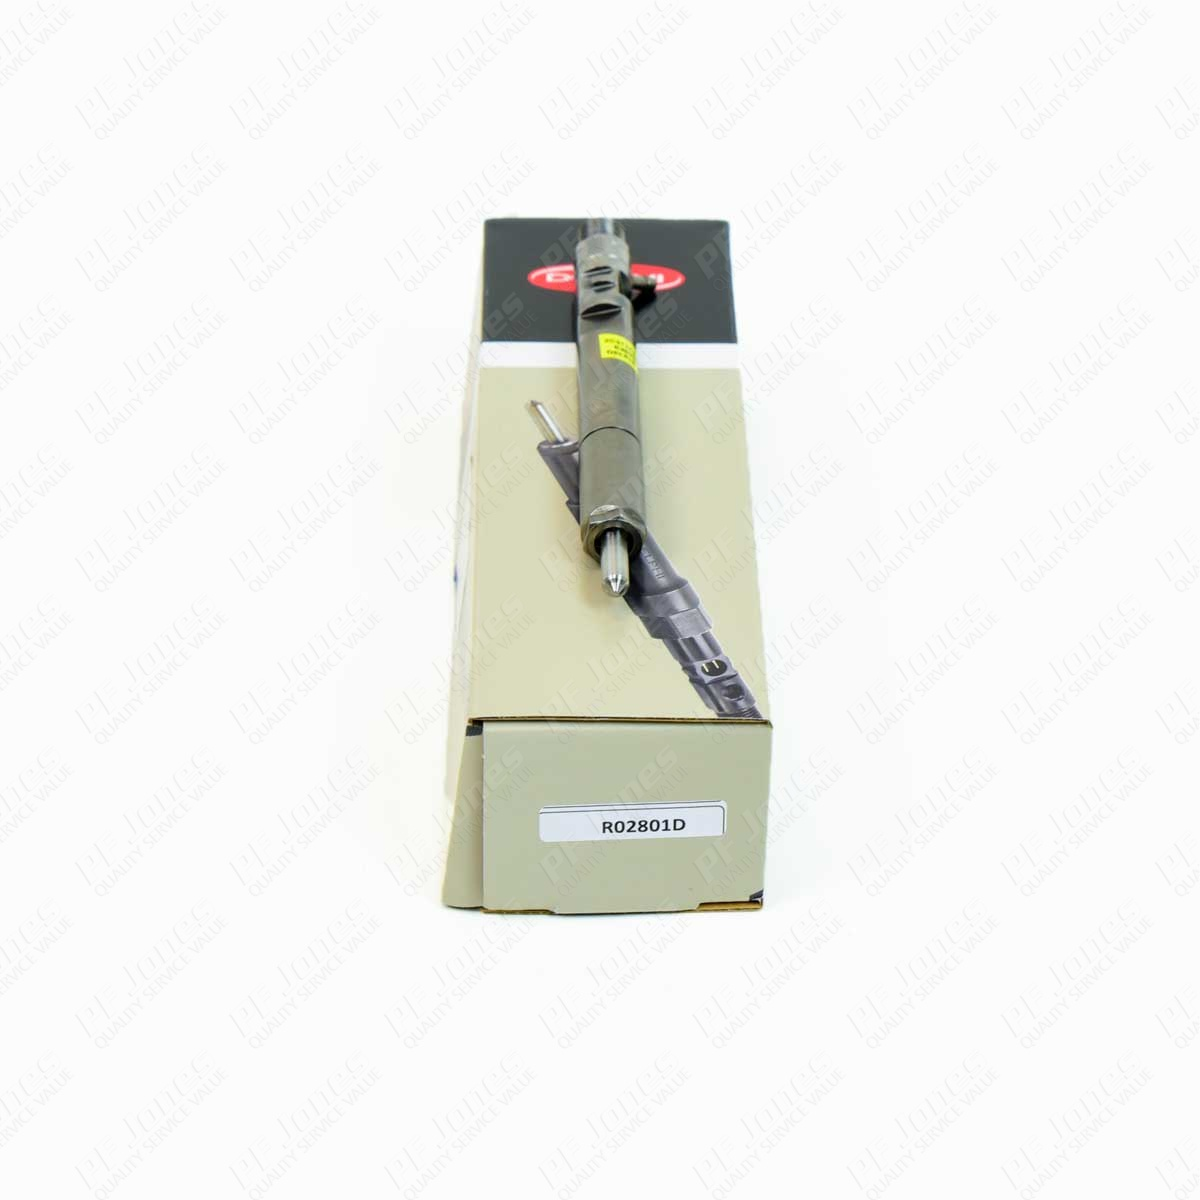 Kia Sedona 2.9 TD 01/1999-10/2001 Reconditioned Delphi Diesel Injector R02801D